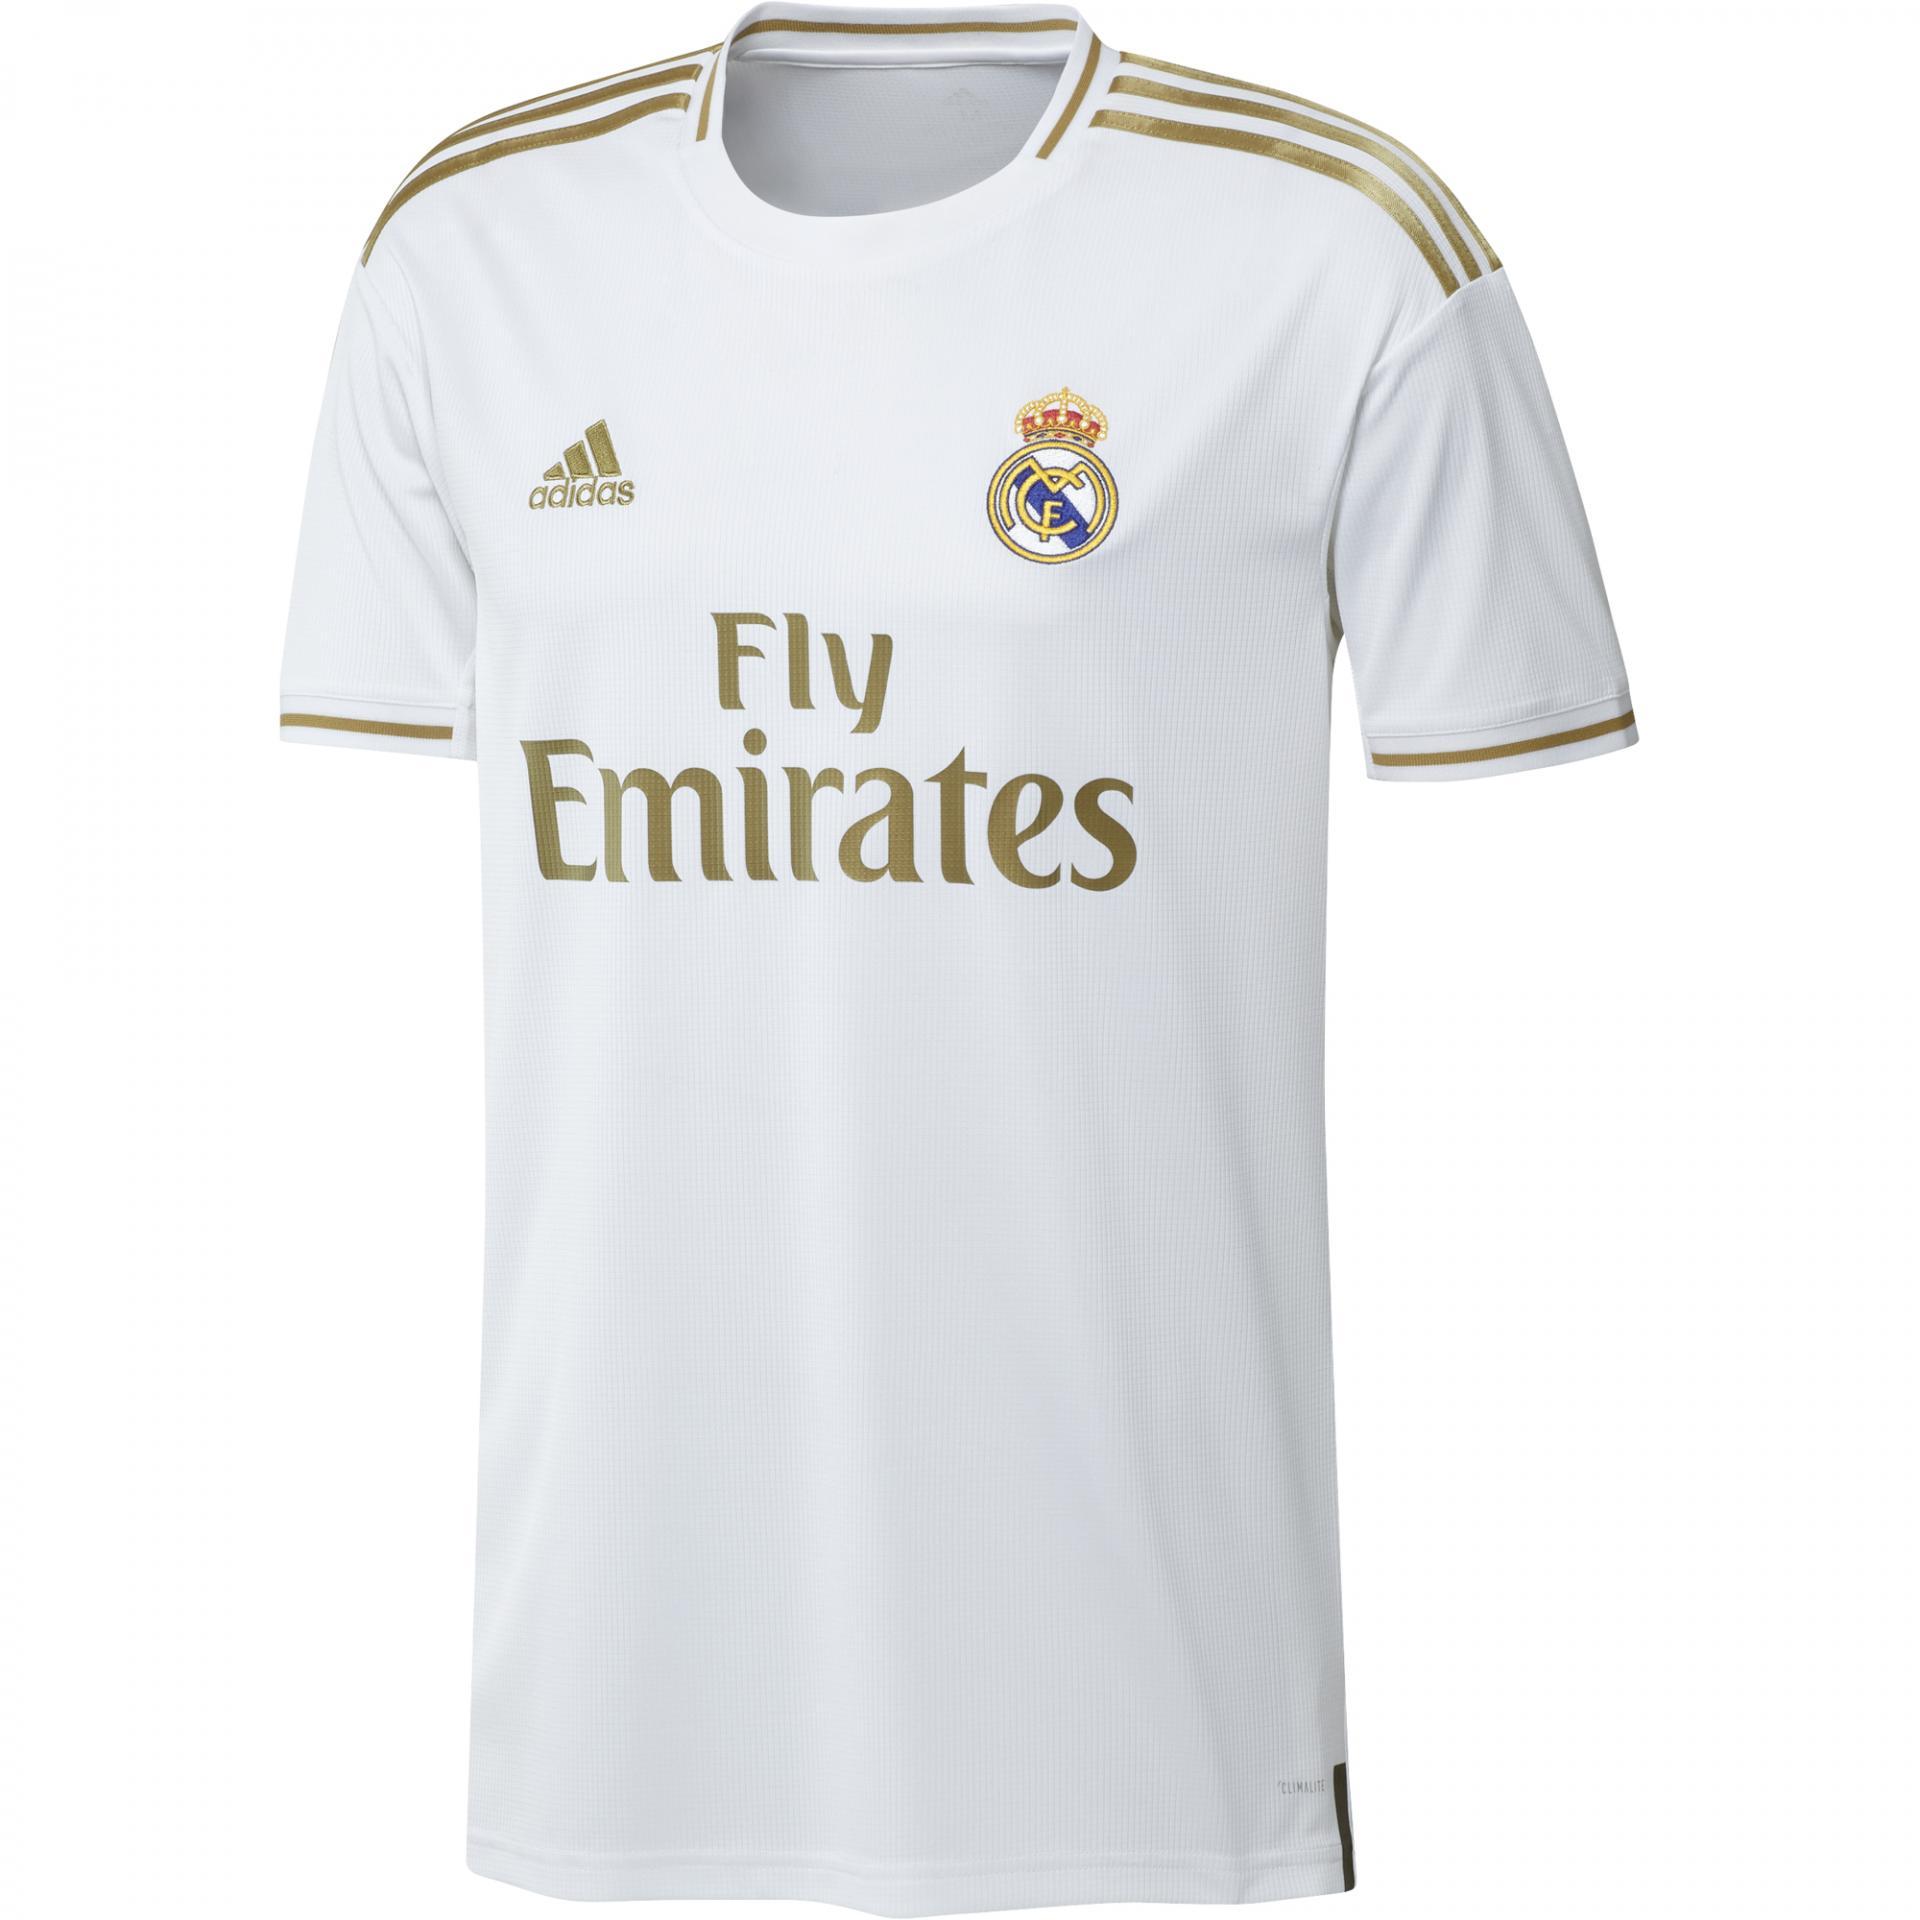 Camiseta Real Madrid Adulto DW4433 Primera equipacion 2019 / 2020